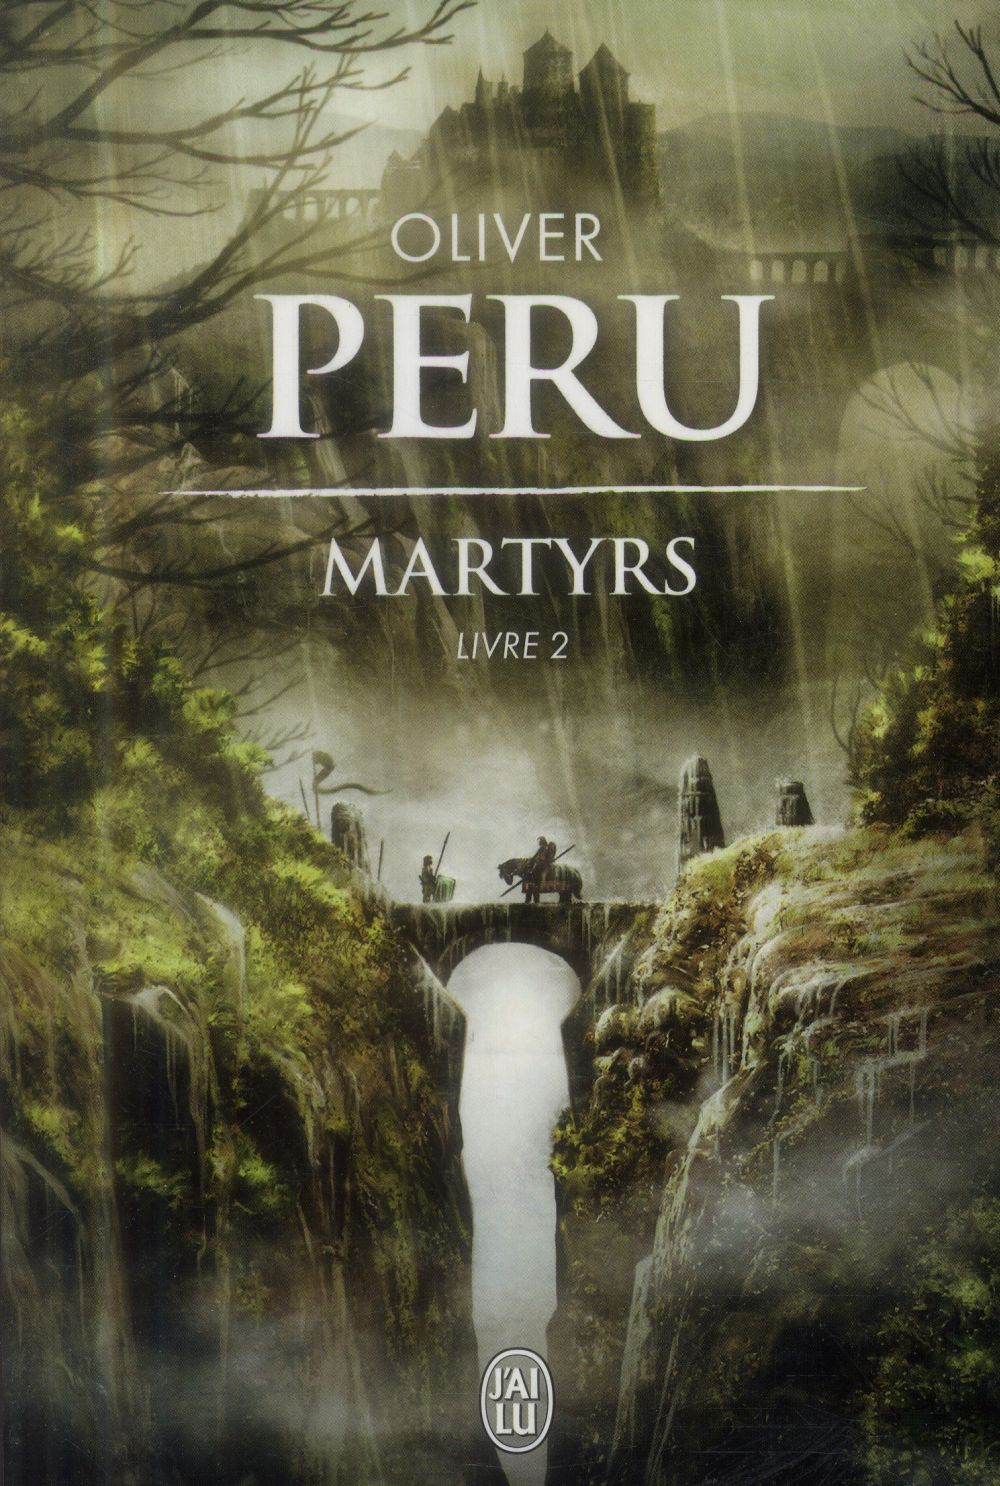 MARTYRS, LIVRE 2